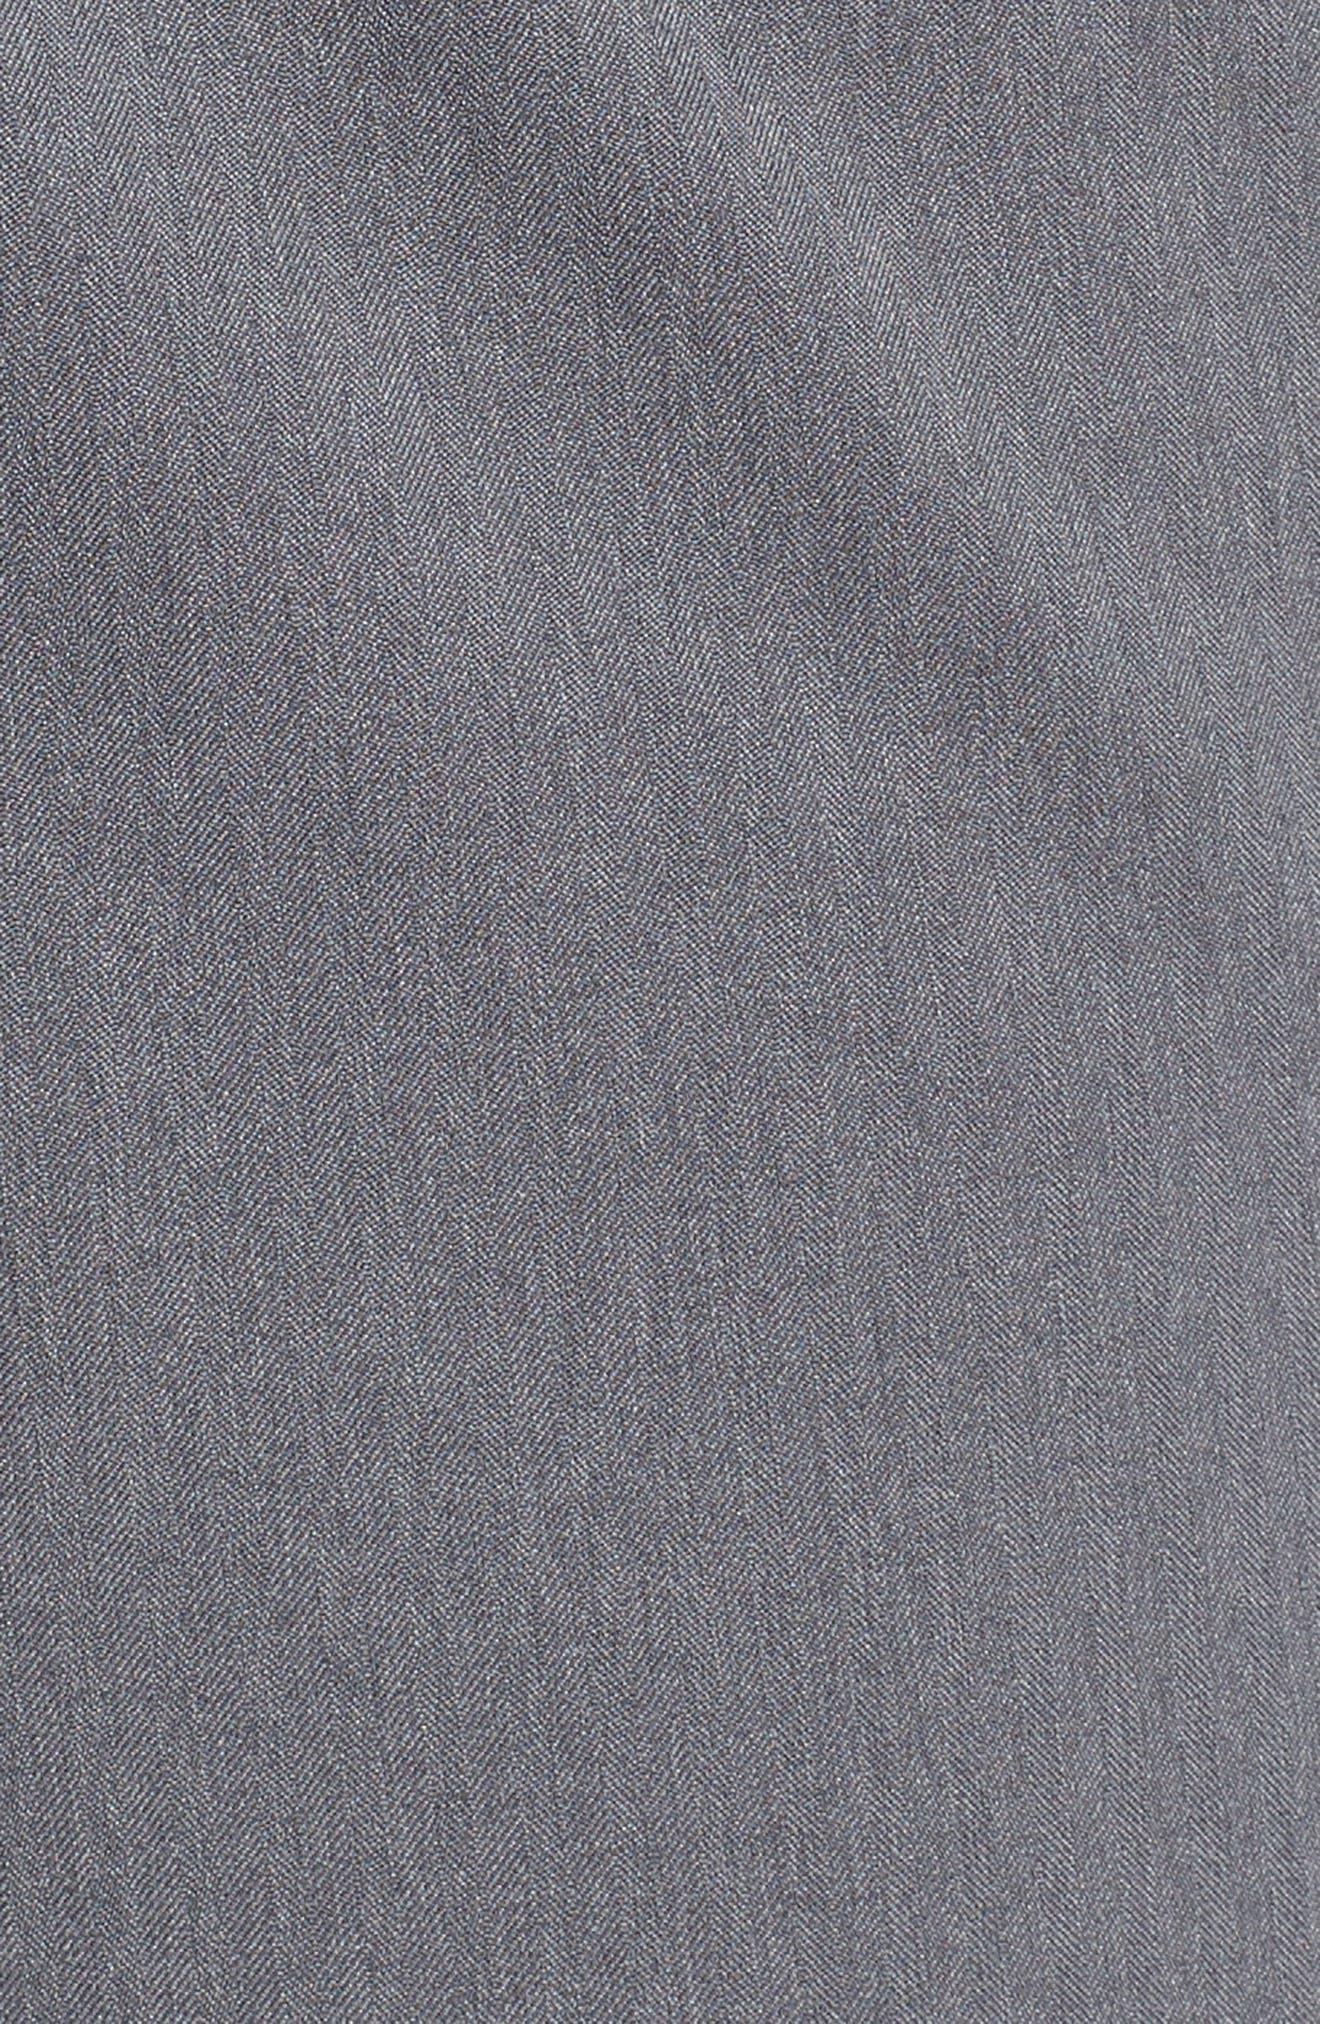 Sportstyle Elite Cargo Shorts,                             Alternate thumbnail 5, color,                             STEEL FULL HEATHER / / BLACK